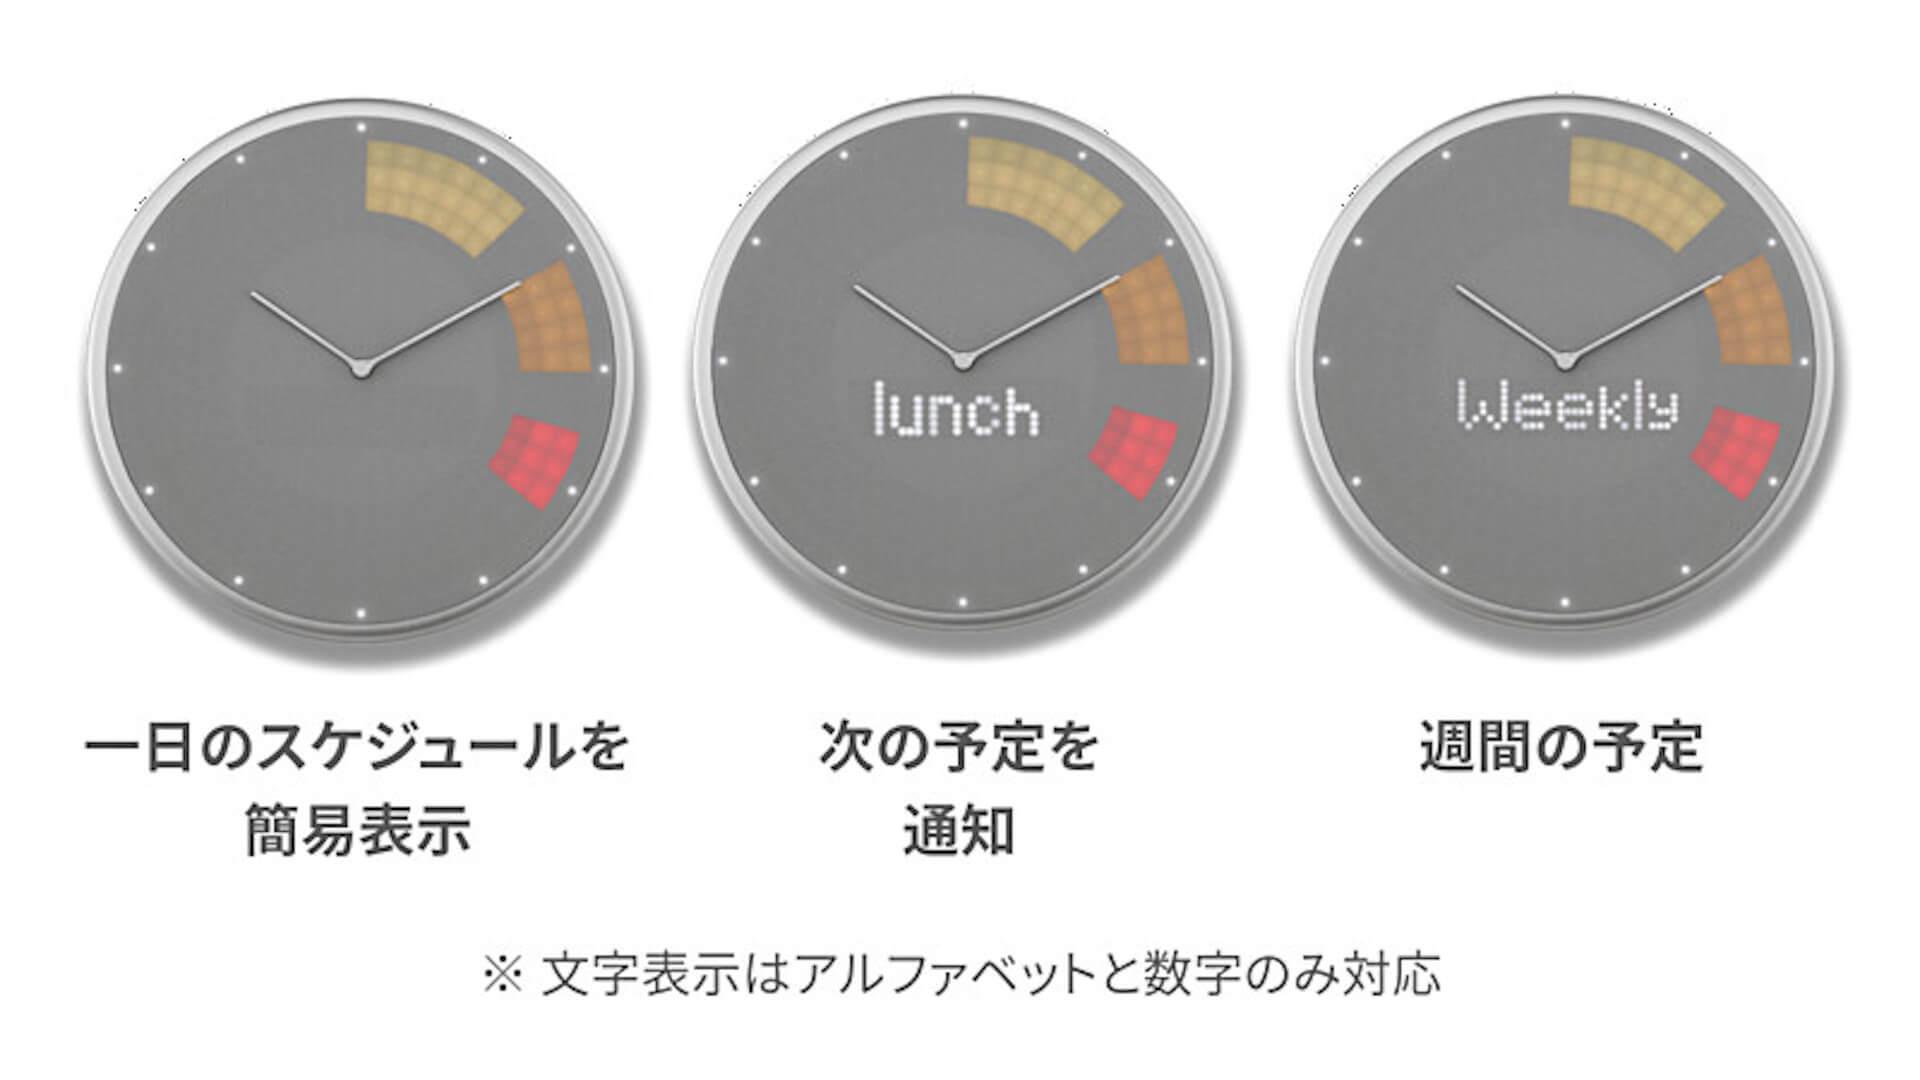 Google・Apple同期でスケジュール管理|忙しい日常をサポートするIoT掛け時計「Glance Clock」が登場 tech190904glanceclock_8